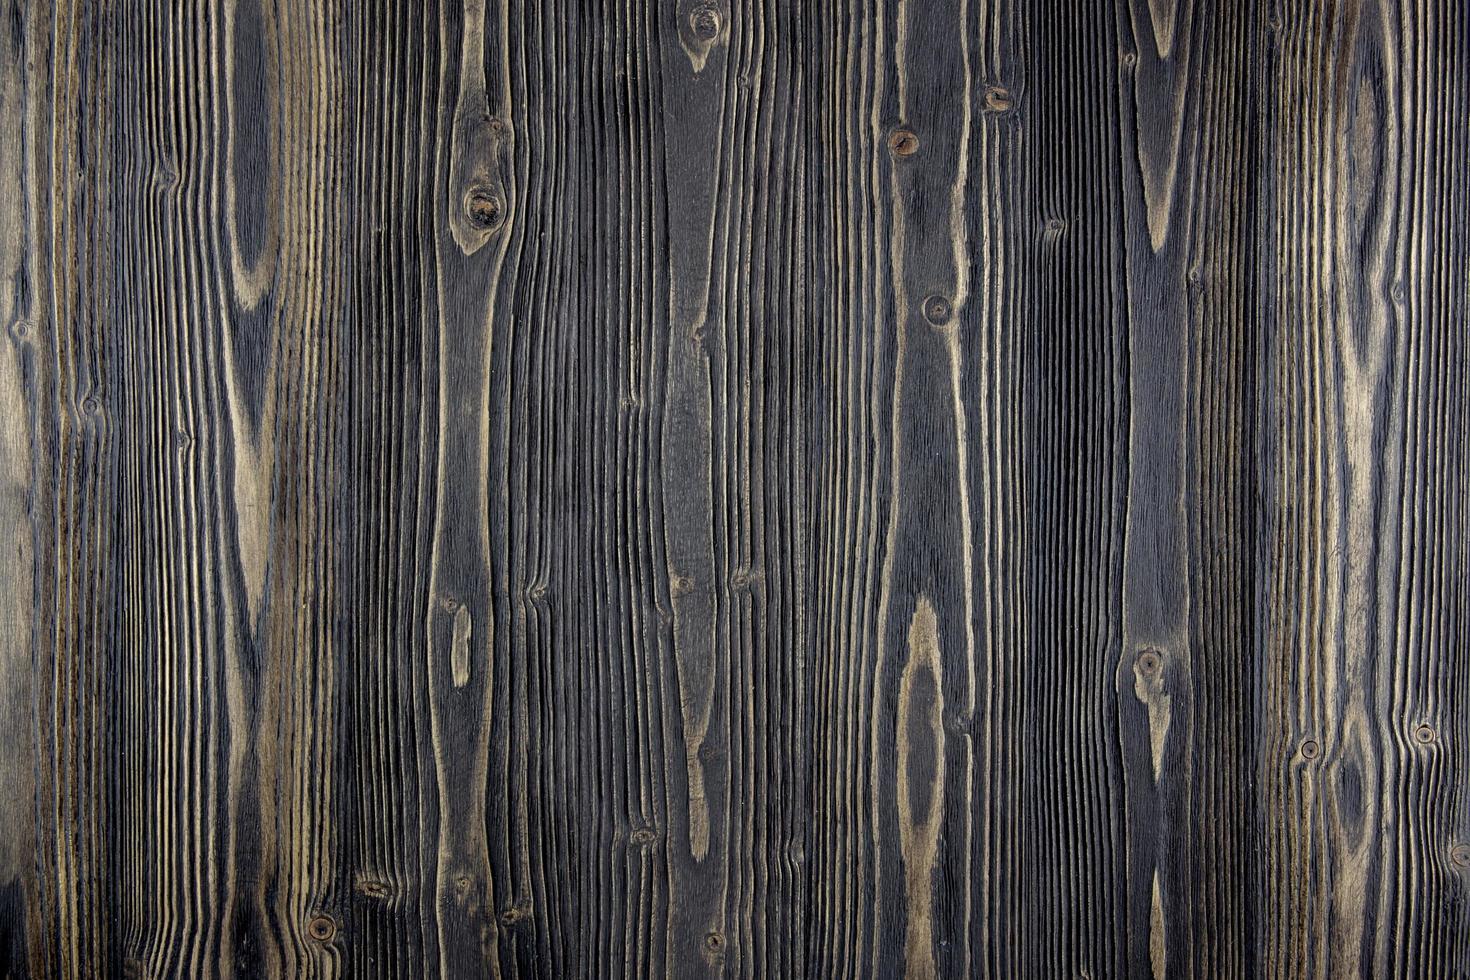 Dark wood table surface photo